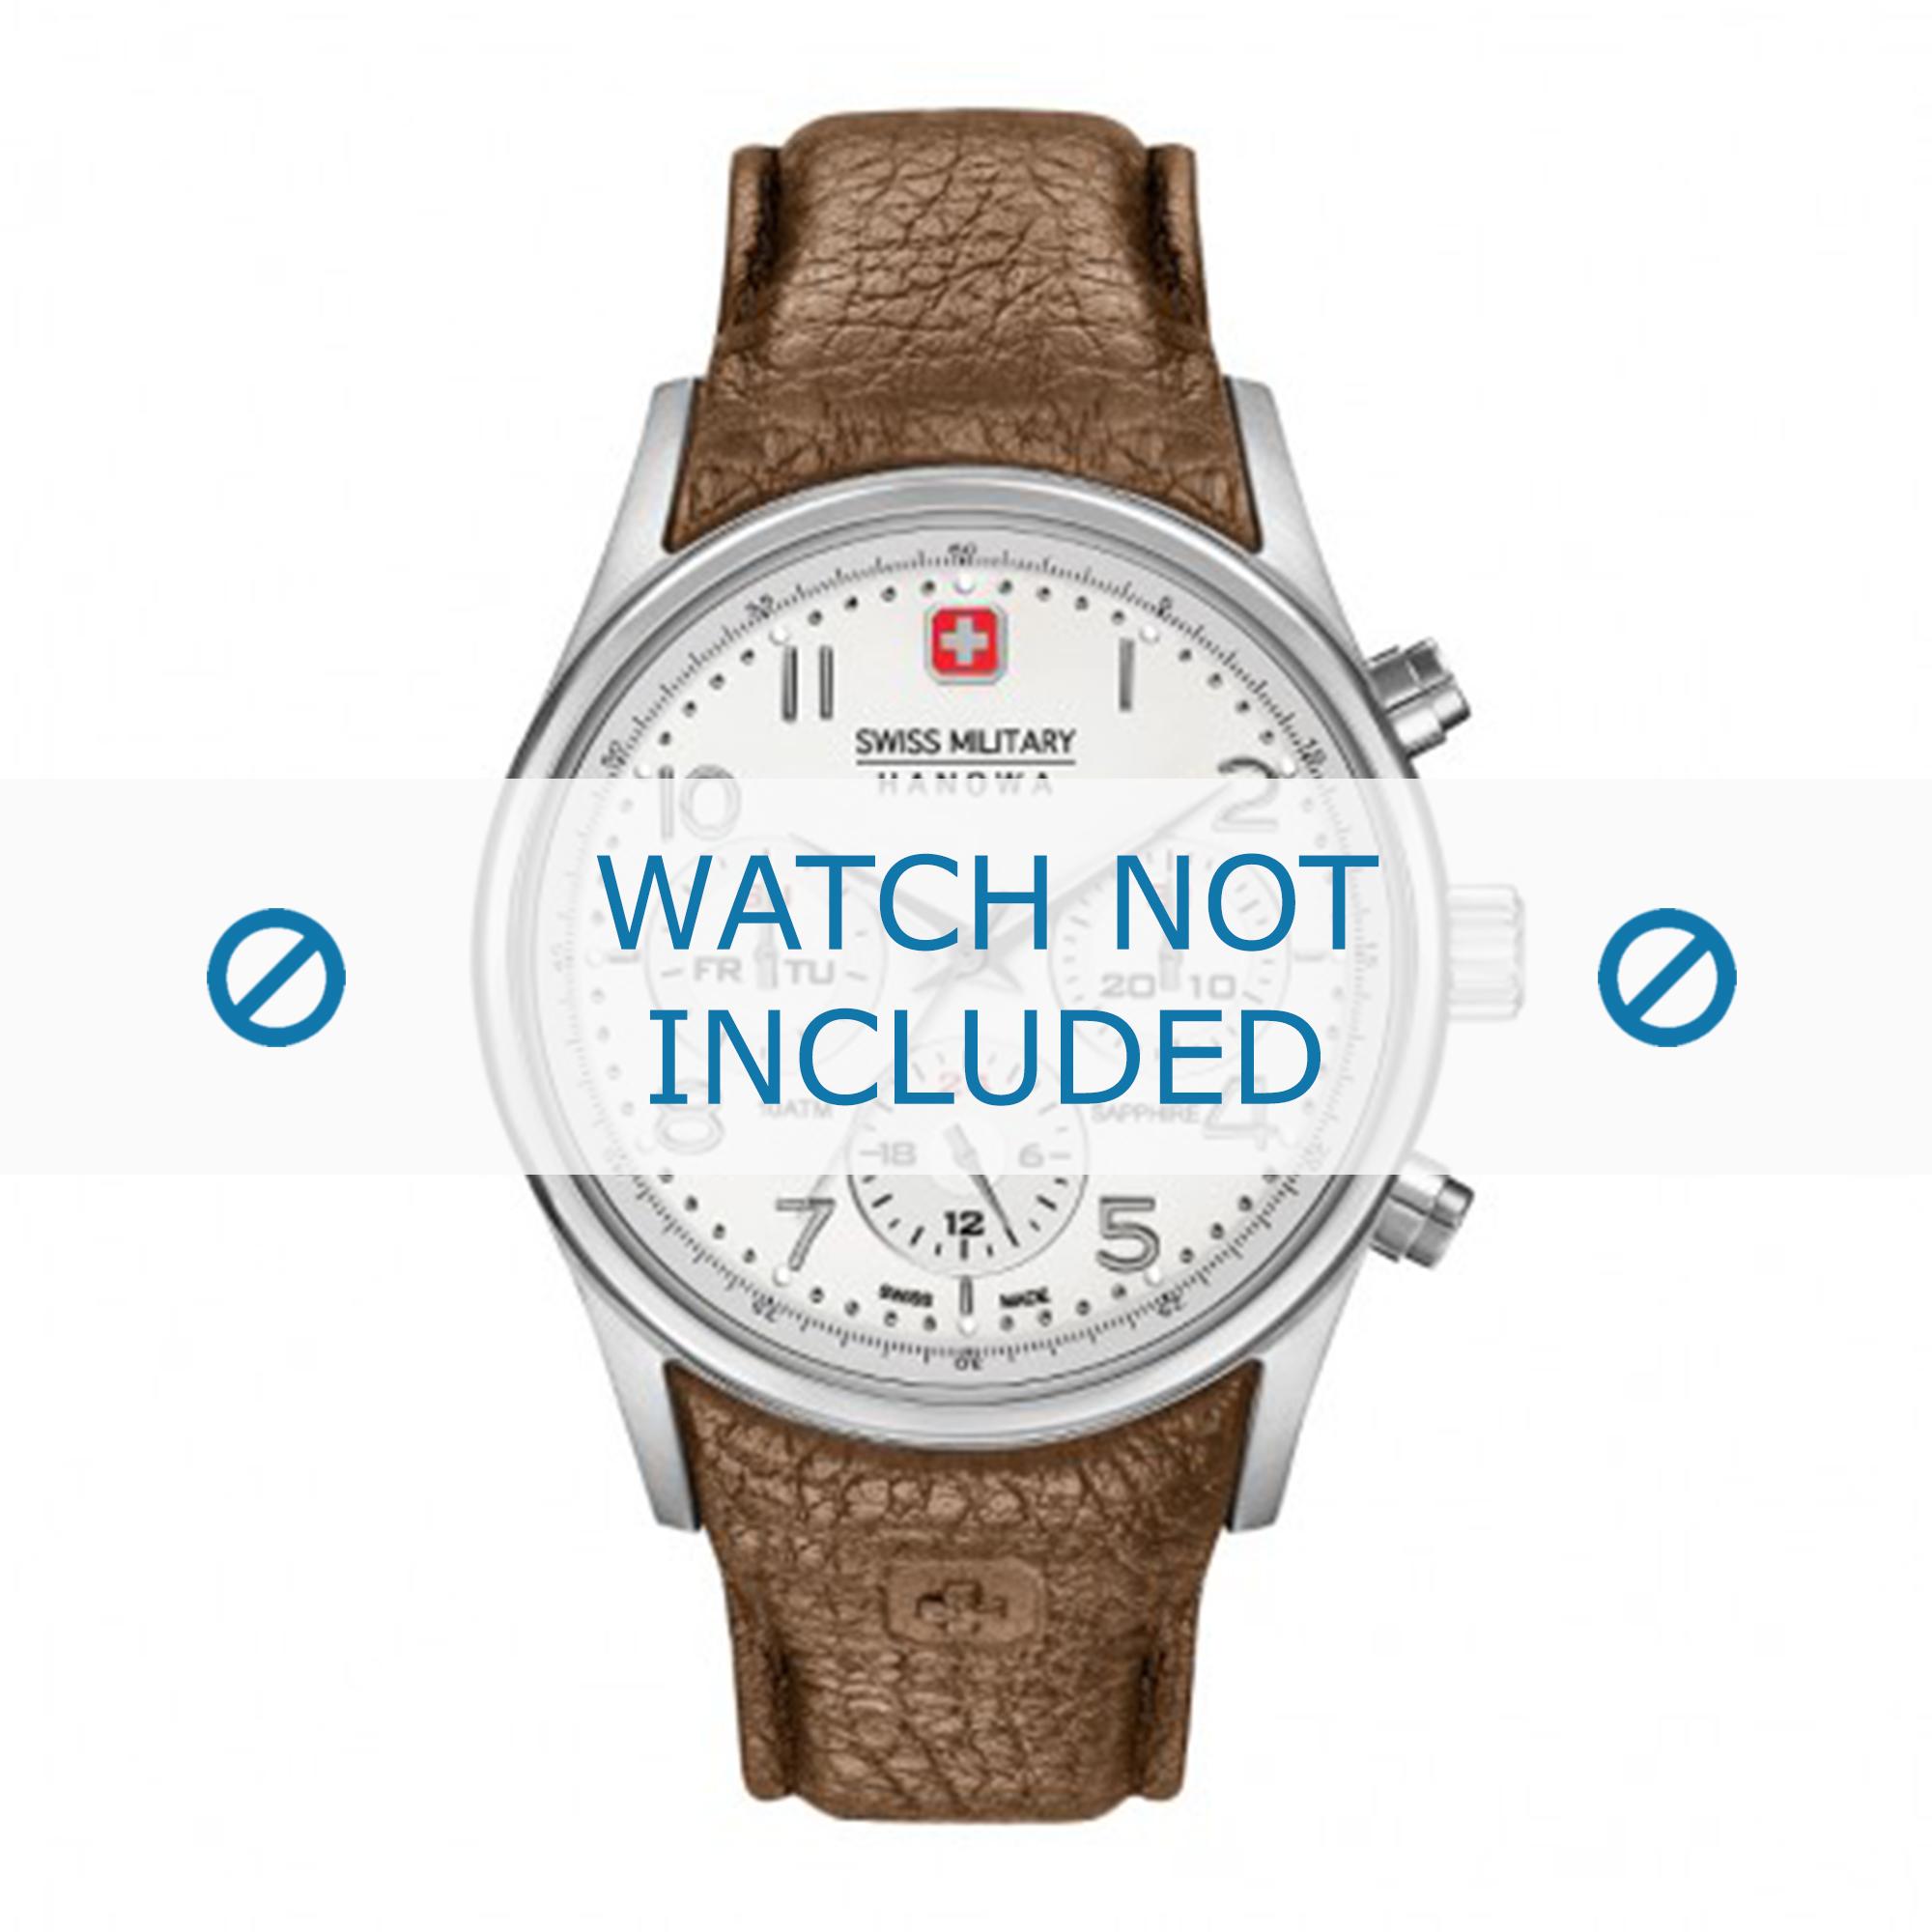 Swiss Military Hanowa horlogeband 06-4278.04.001.05 Leder Cream wit / Beige / Ivoor + standaard stiksel